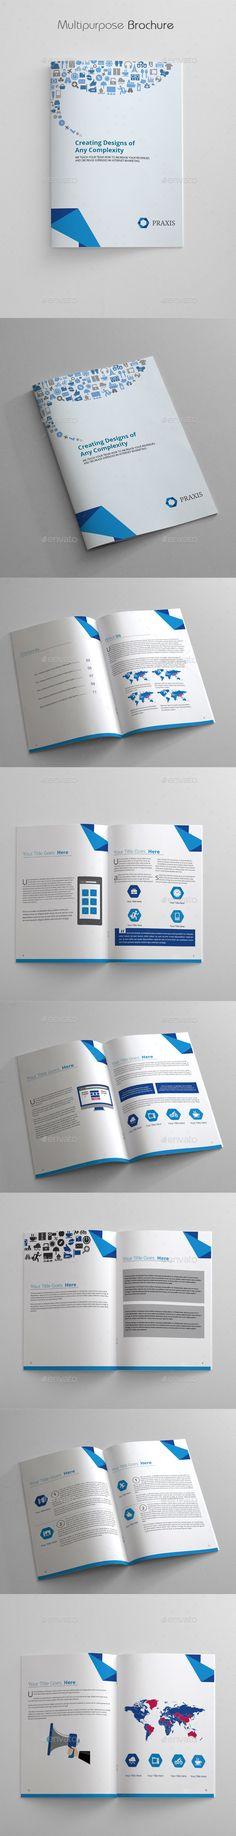 Multipurpose Brochure Template #design  Download: http://graphicriver.net/item/multipurpose-brochure/12324025?ref=ksioks